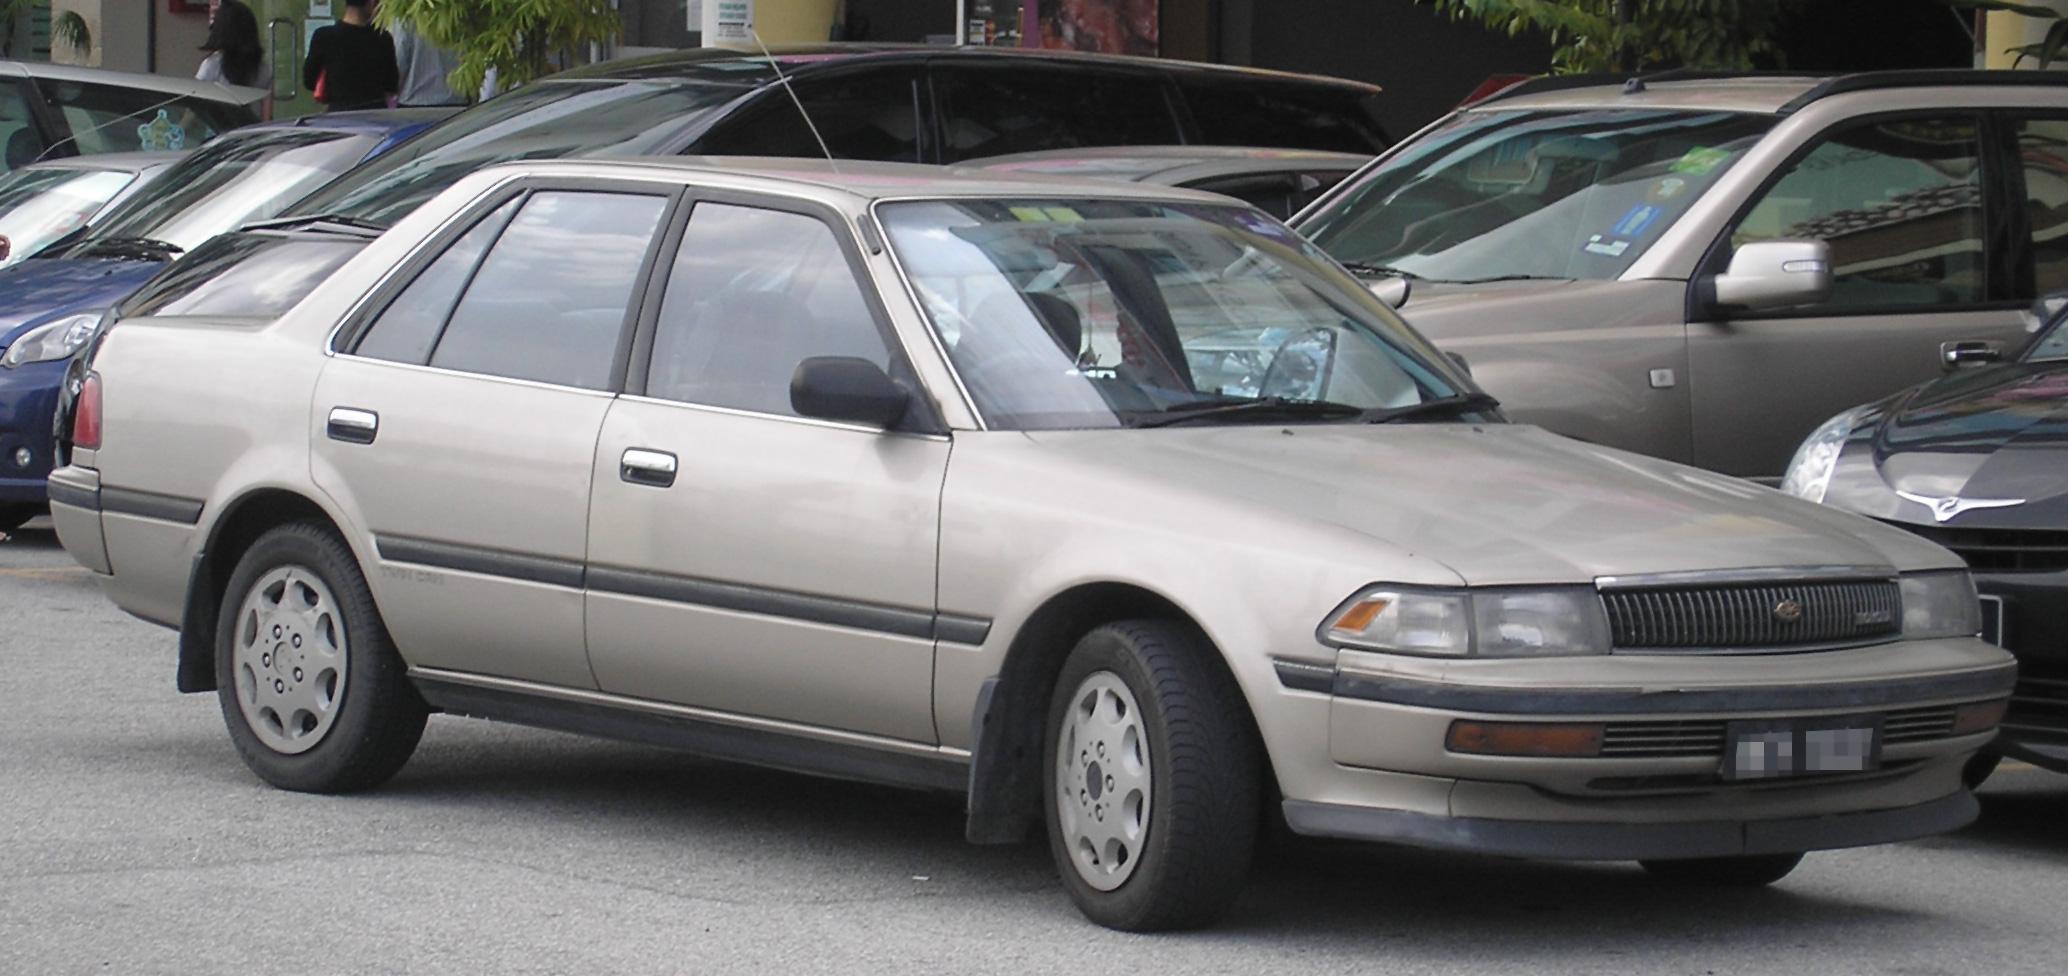 Toyota Corona VIII (T170) 1987 - 1992 Station wagon 5 door #5